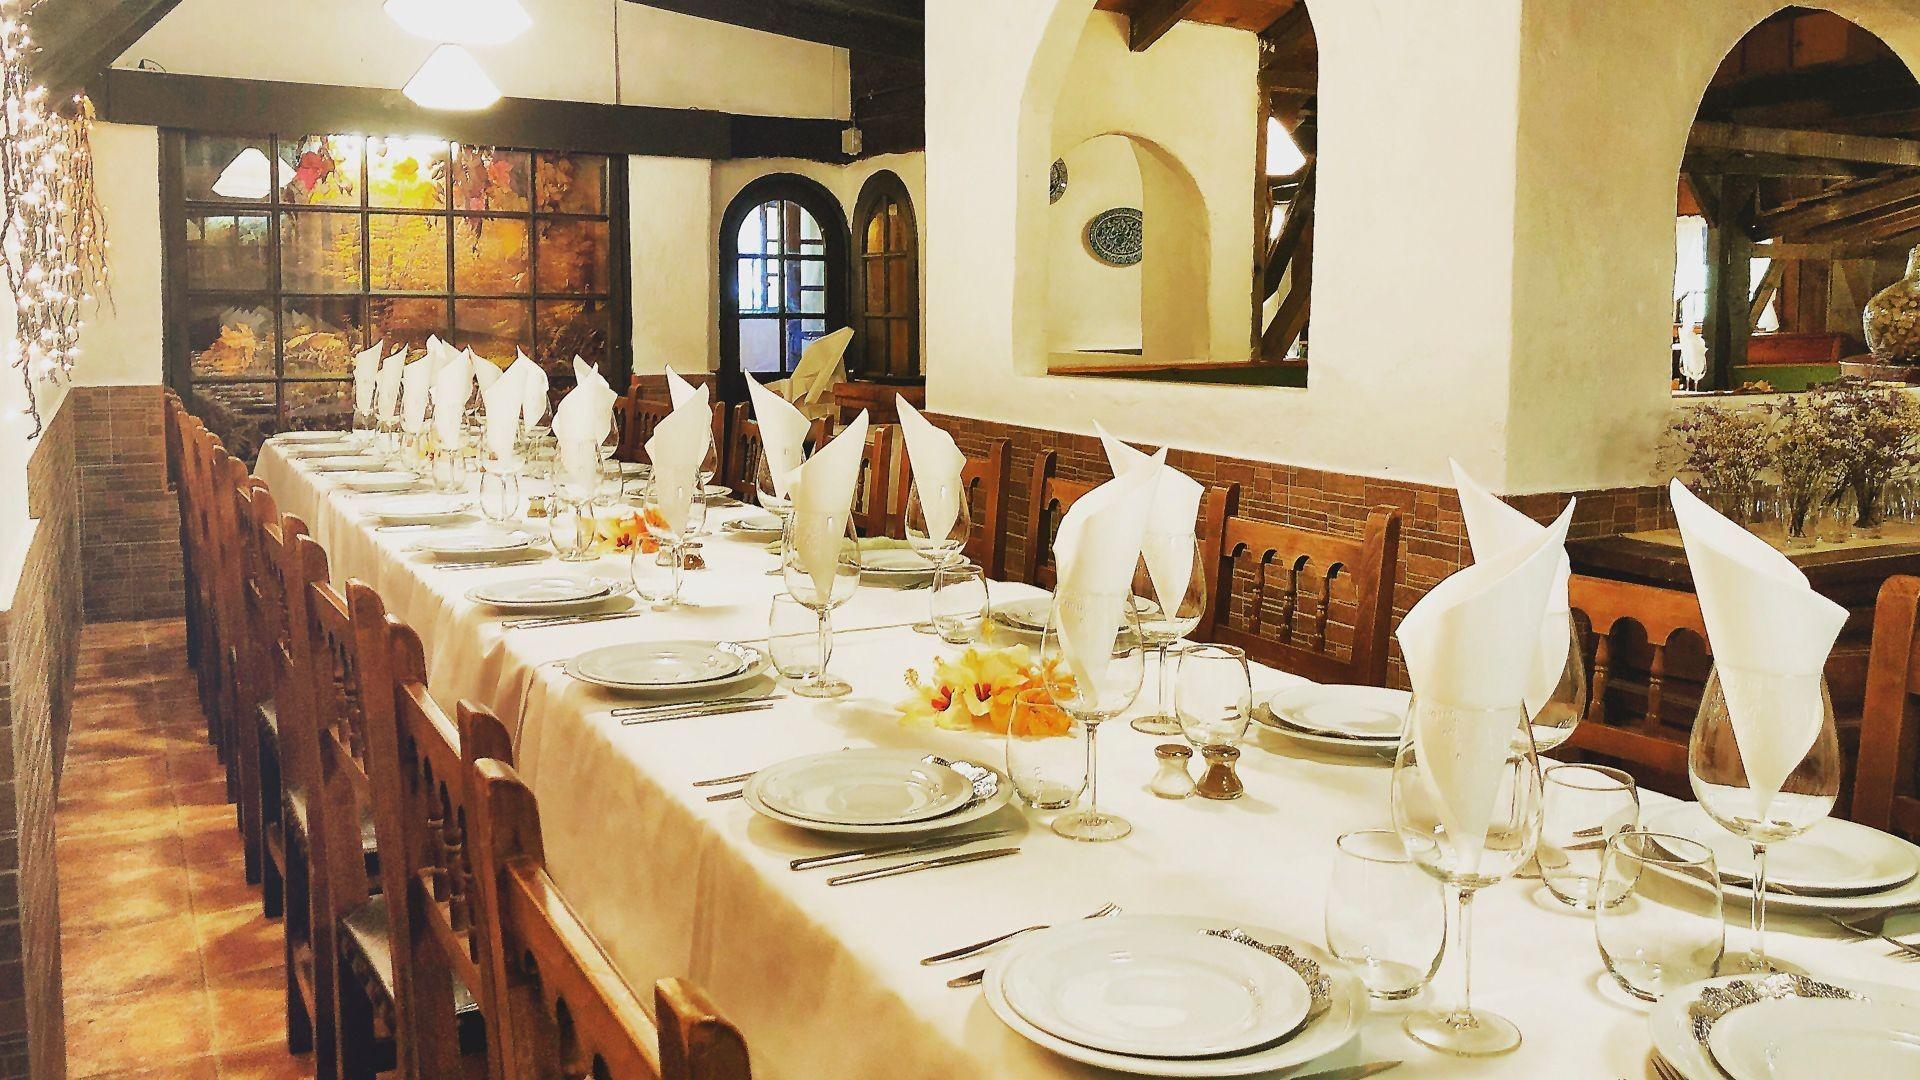 Restaurante Las Chozas Santa Cruz de Tenerife